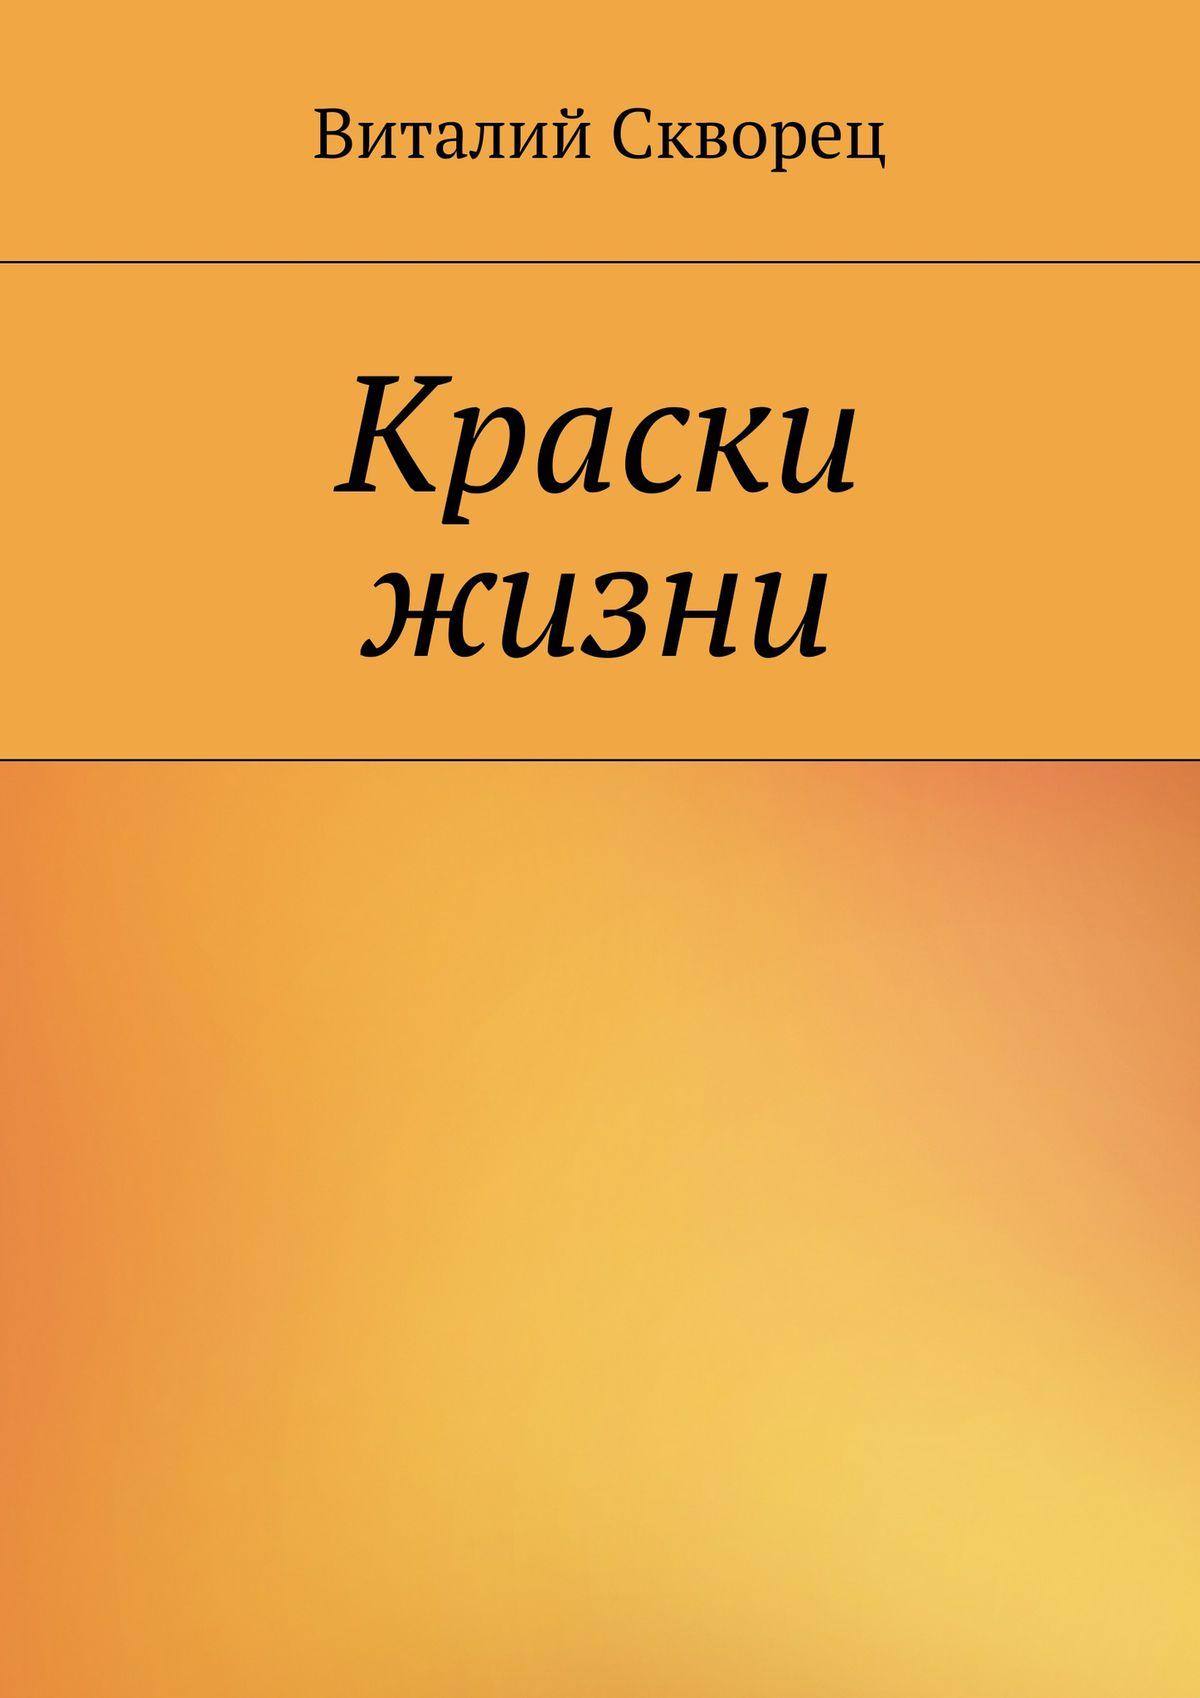 цена на Виталий Скворец Краски жизни